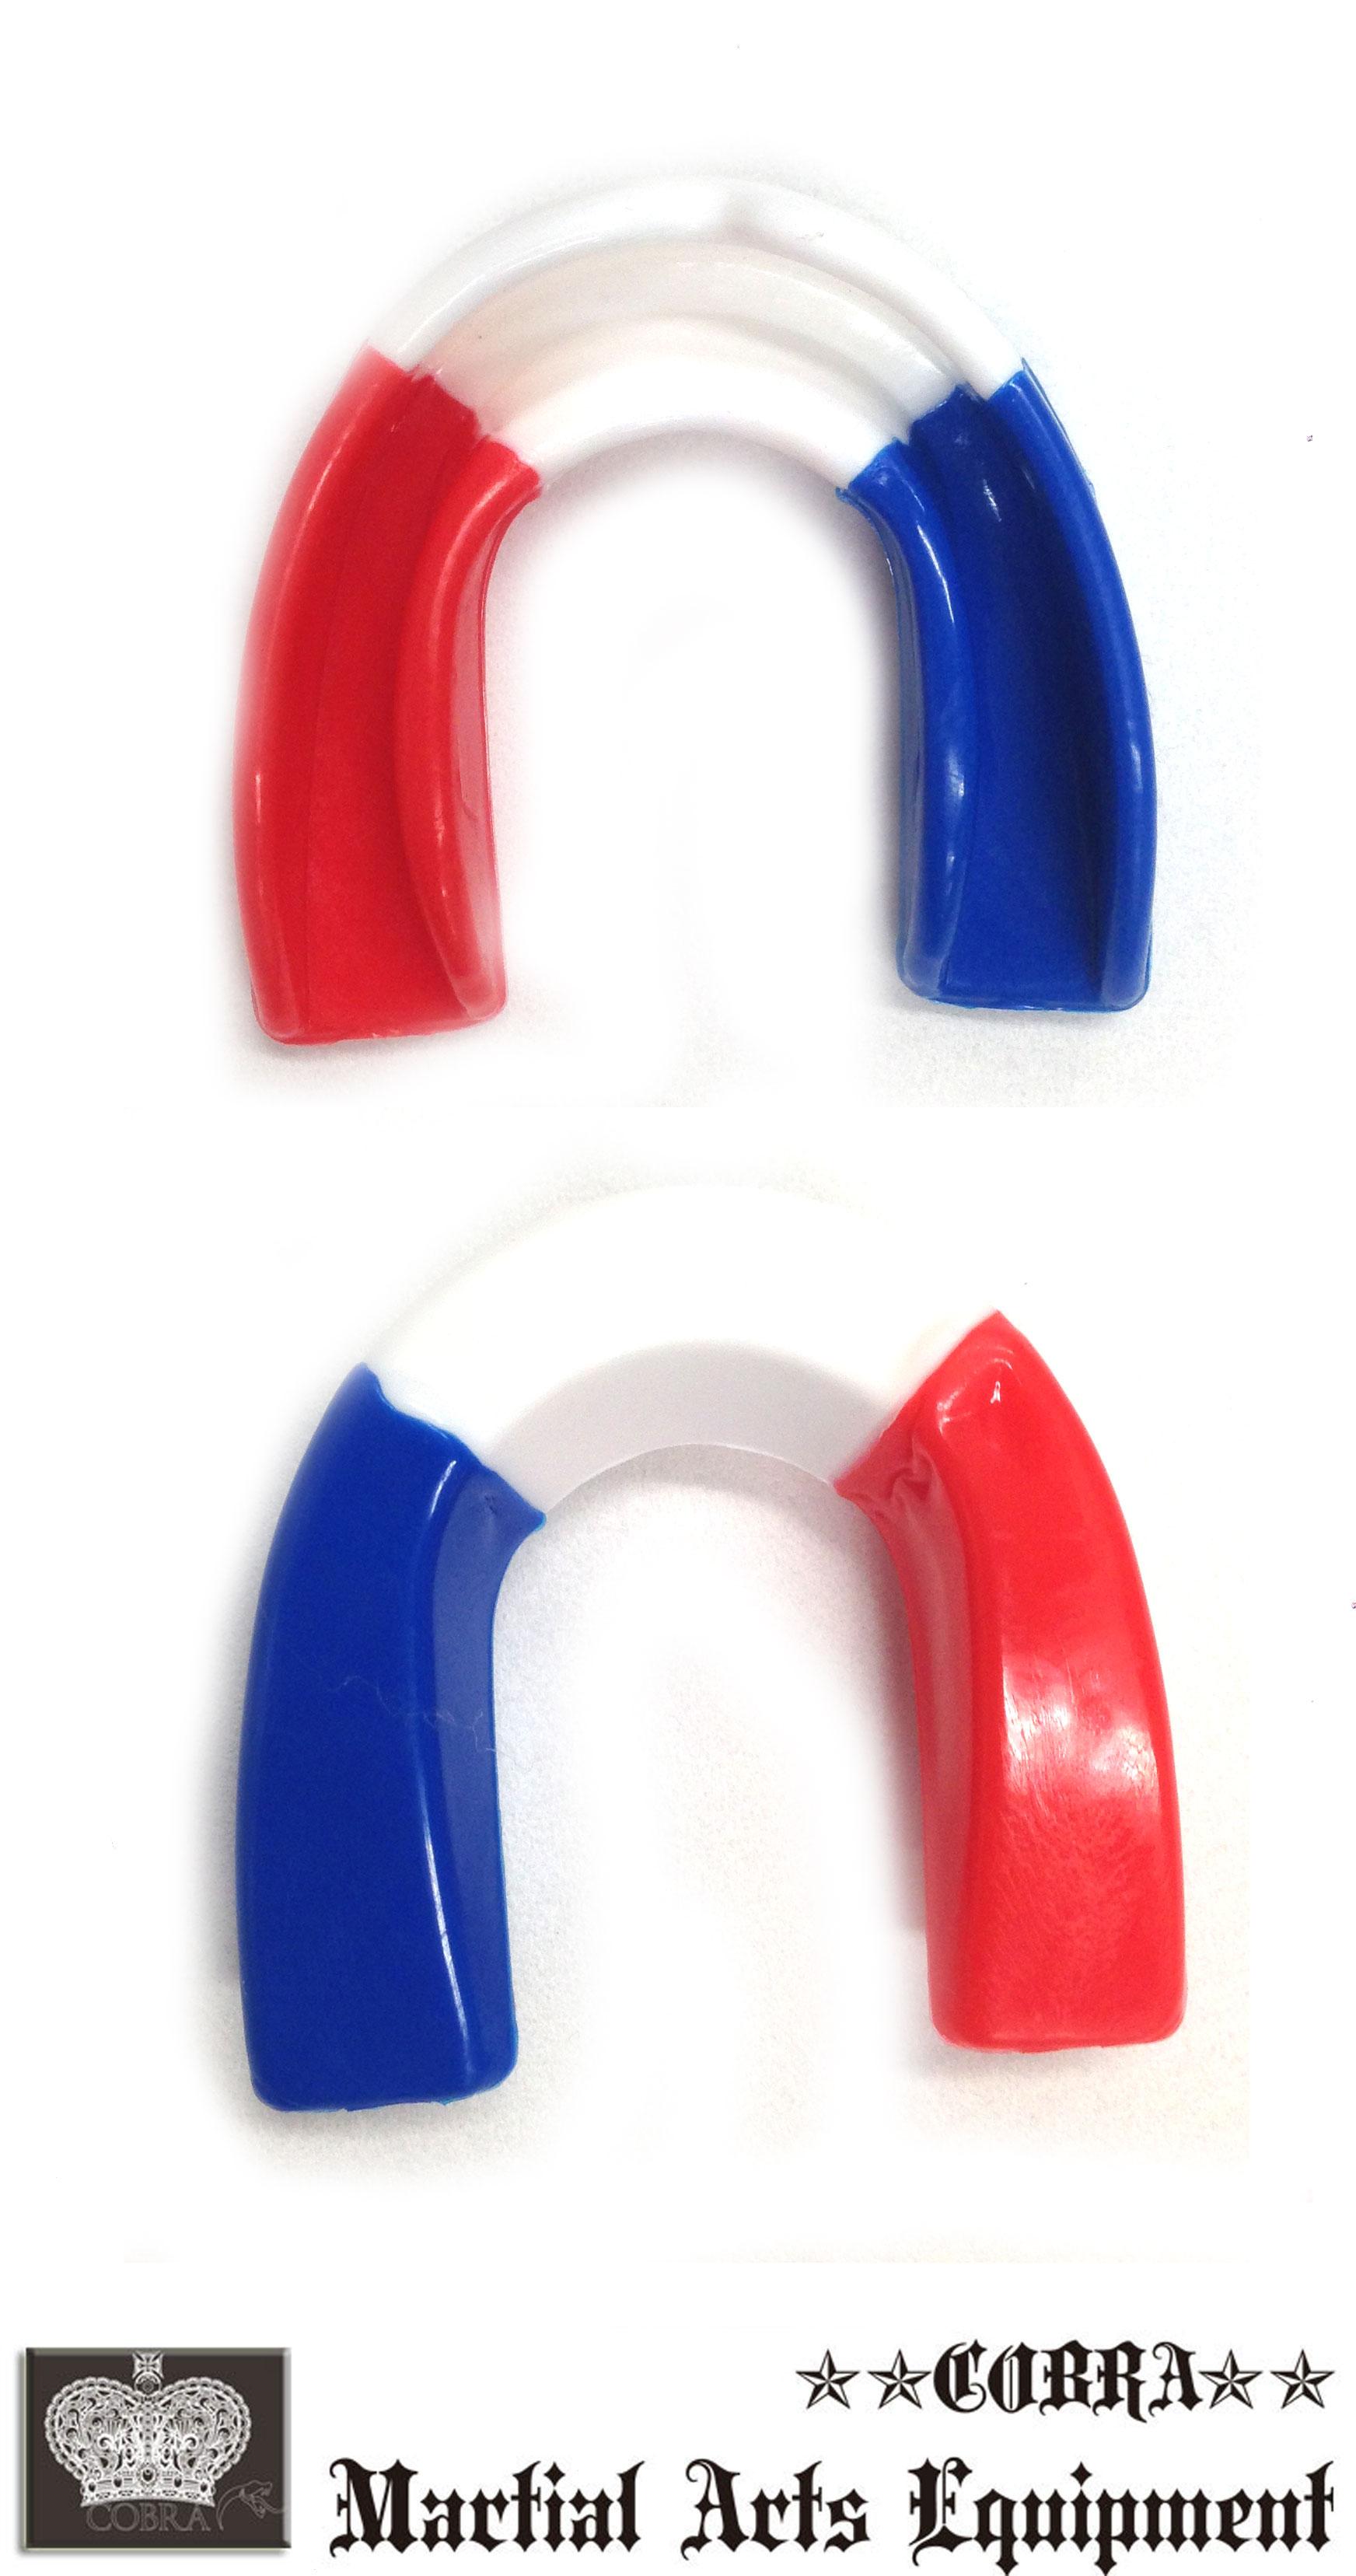 COBRA カラフルマウスピース(ケース付き)MOUTH GUARD BLUE/WHITE/RED(USA カラー)